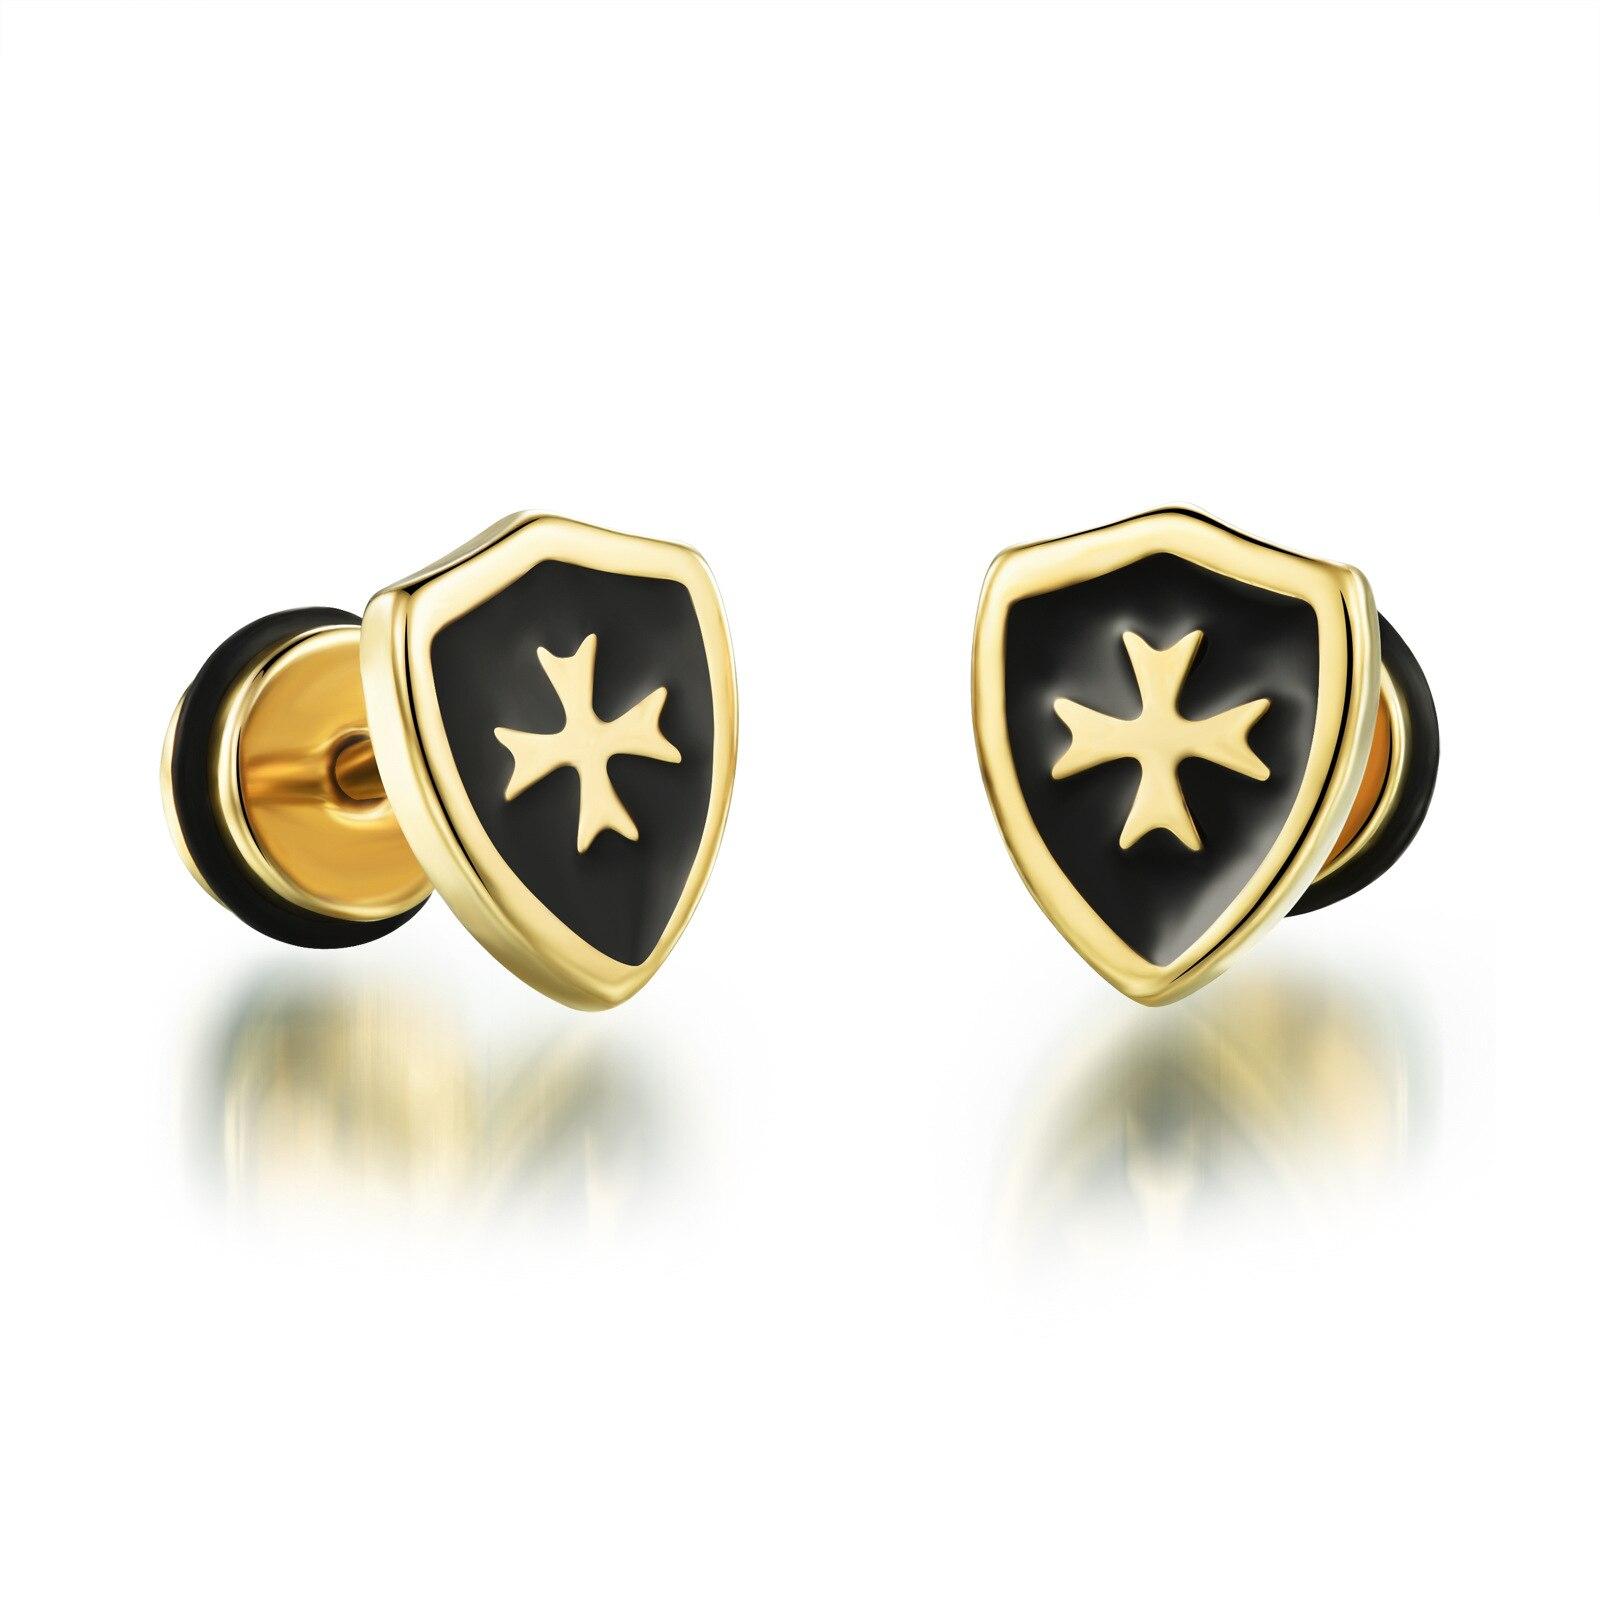 Samll Cool Man Cross Stud Earrings For Men Punk Style Gold Ptelad Stainless  Steel Earring Fashion Men's Jewelry Antiallergy